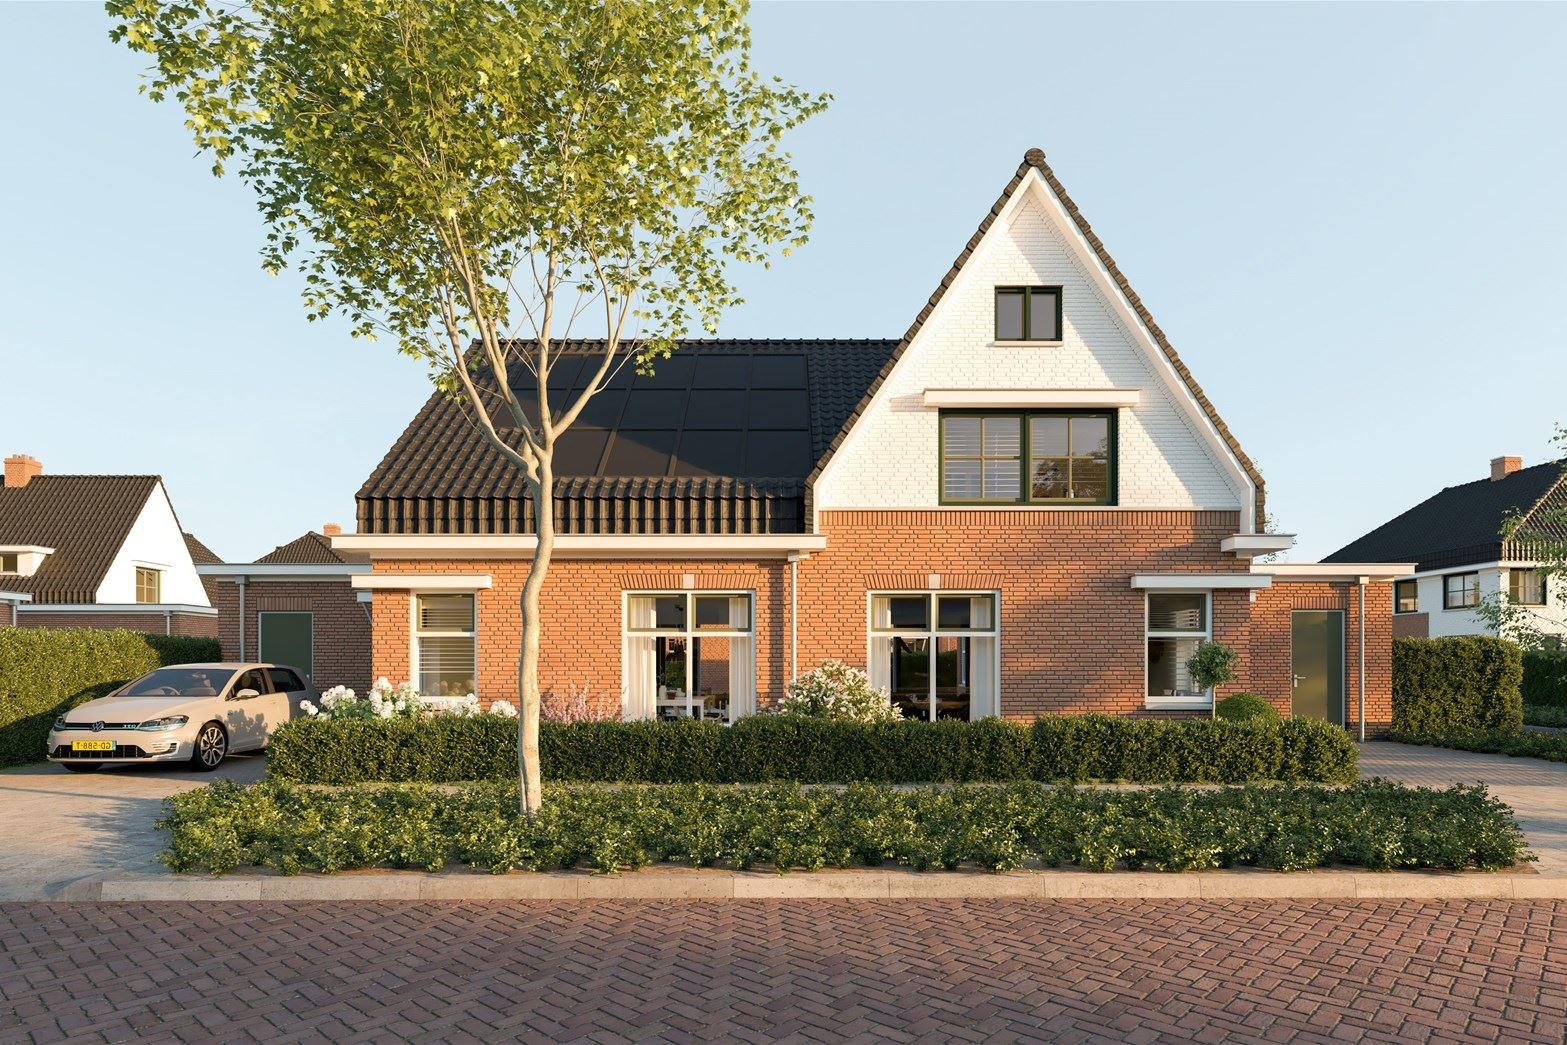 Semi Bungalow Bouwen : Huis te koop: 50 semi bungalow tuindorp land van dico 5404 nj